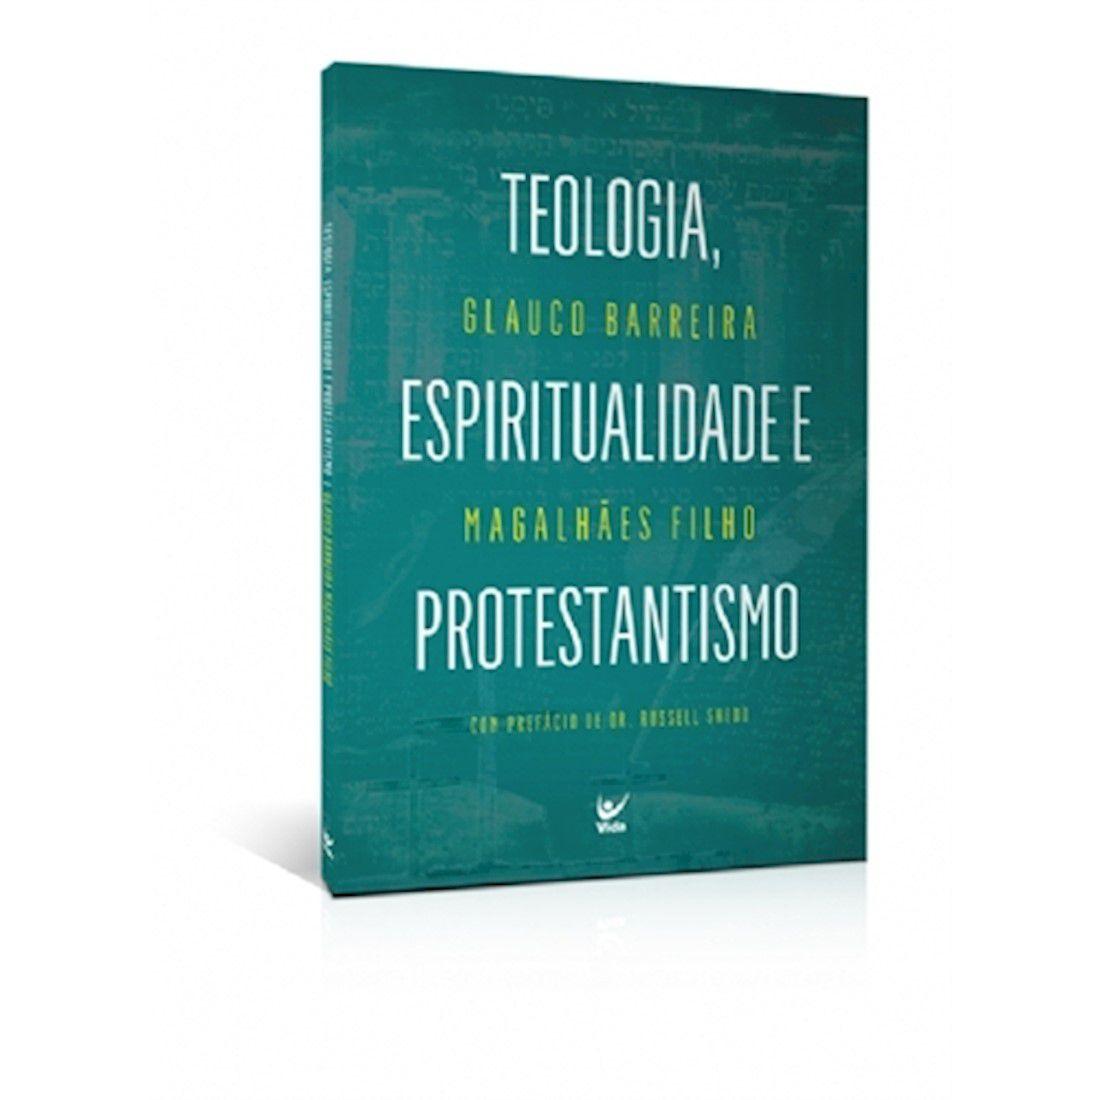 Livro Teologia, Espiritualidade e Protestantismo